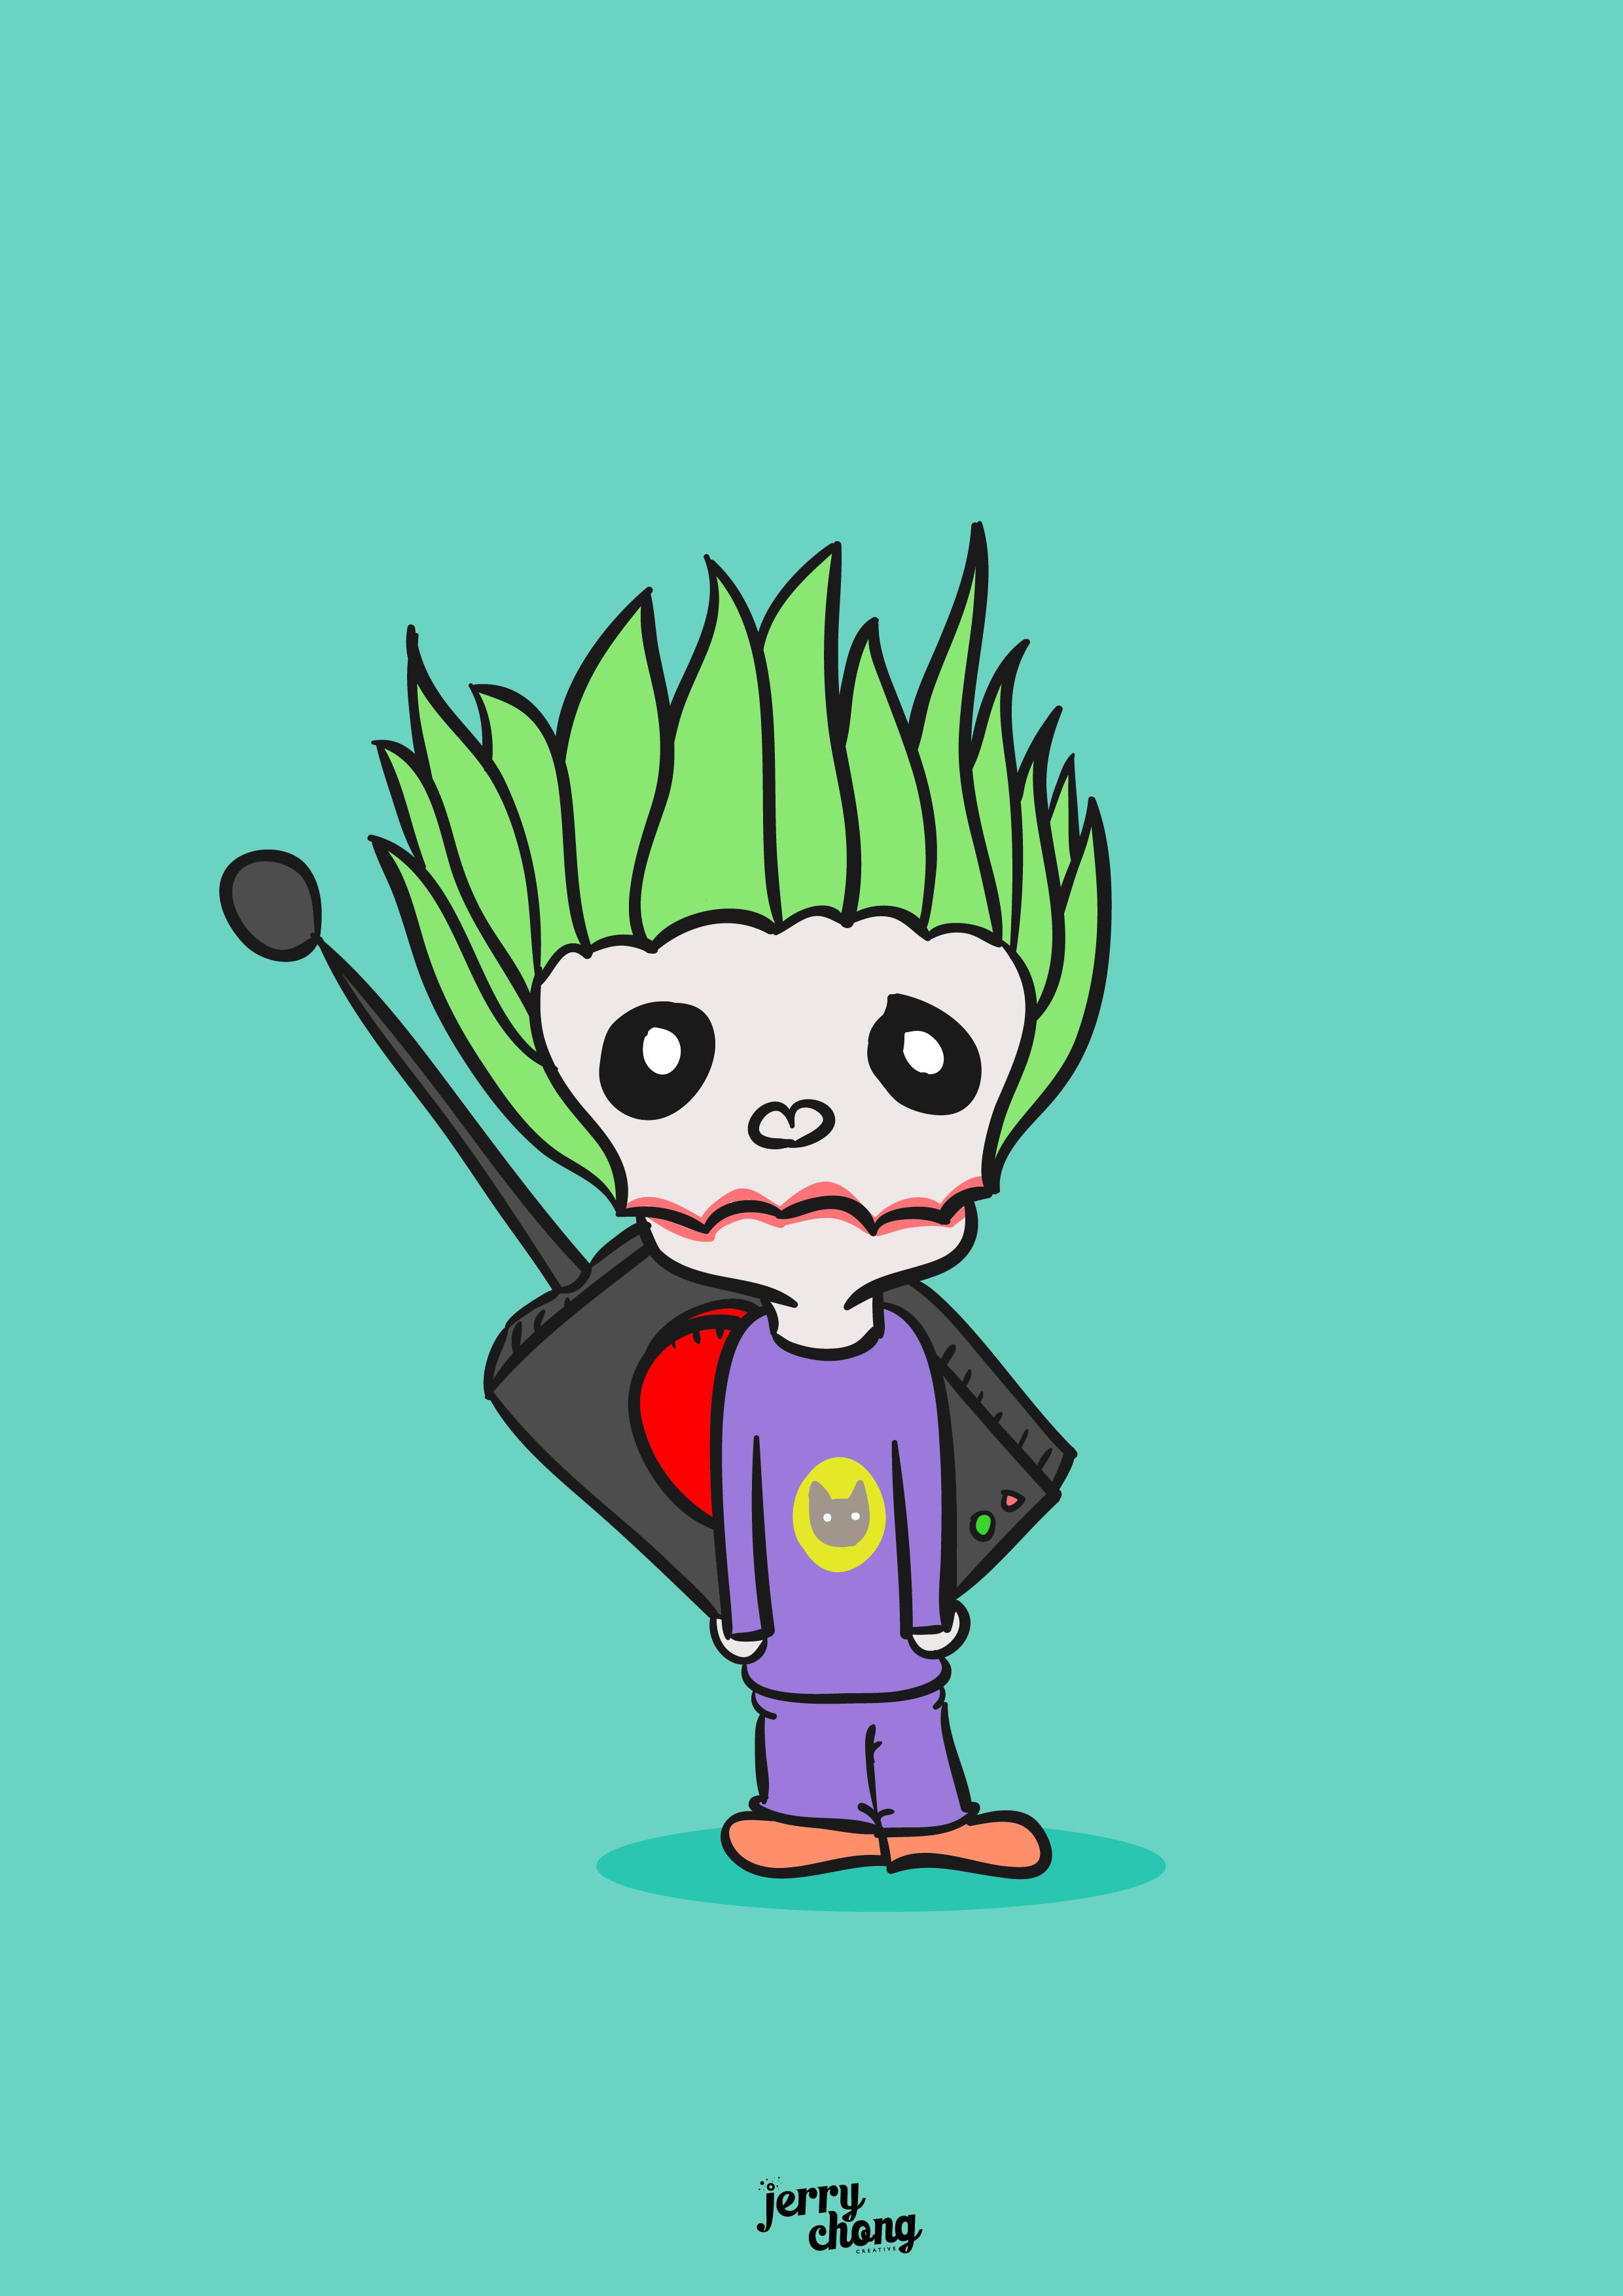 JokerThe Junior